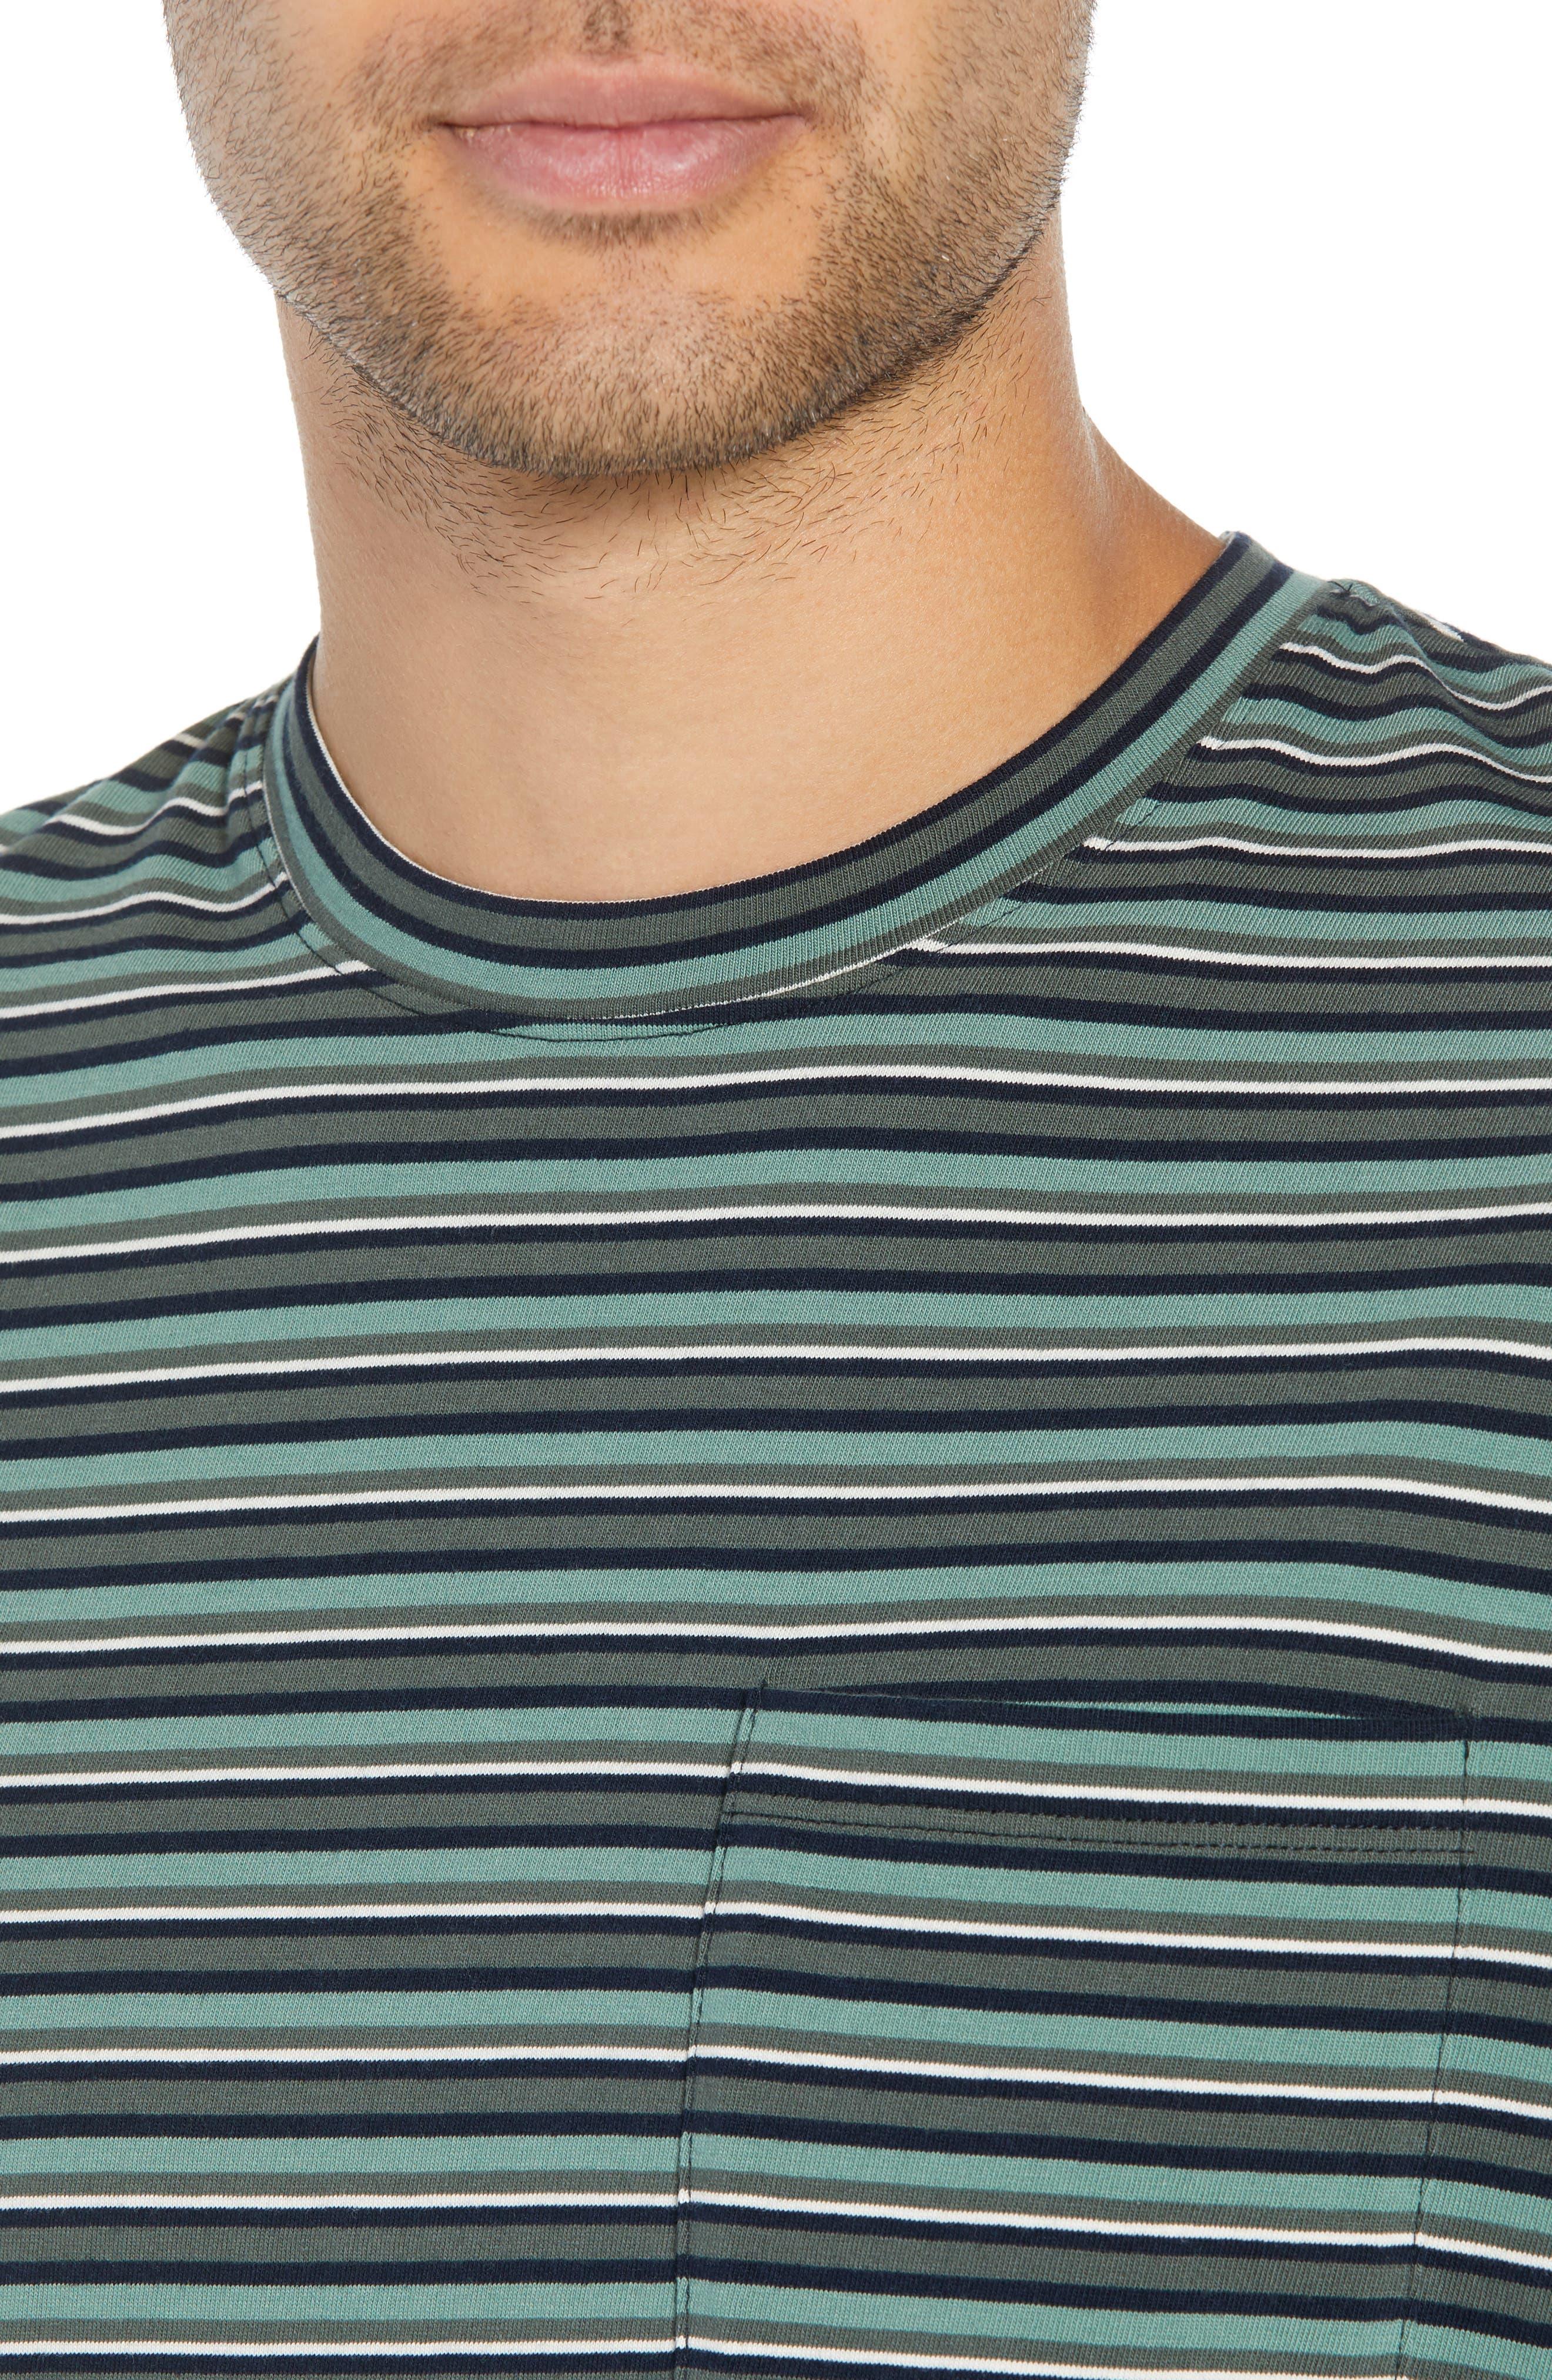 Regular Fit Multistripe Pocket T-Shirt,                             Alternate thumbnail 4, color,                             URBAN GREEN/ SPEARMINT